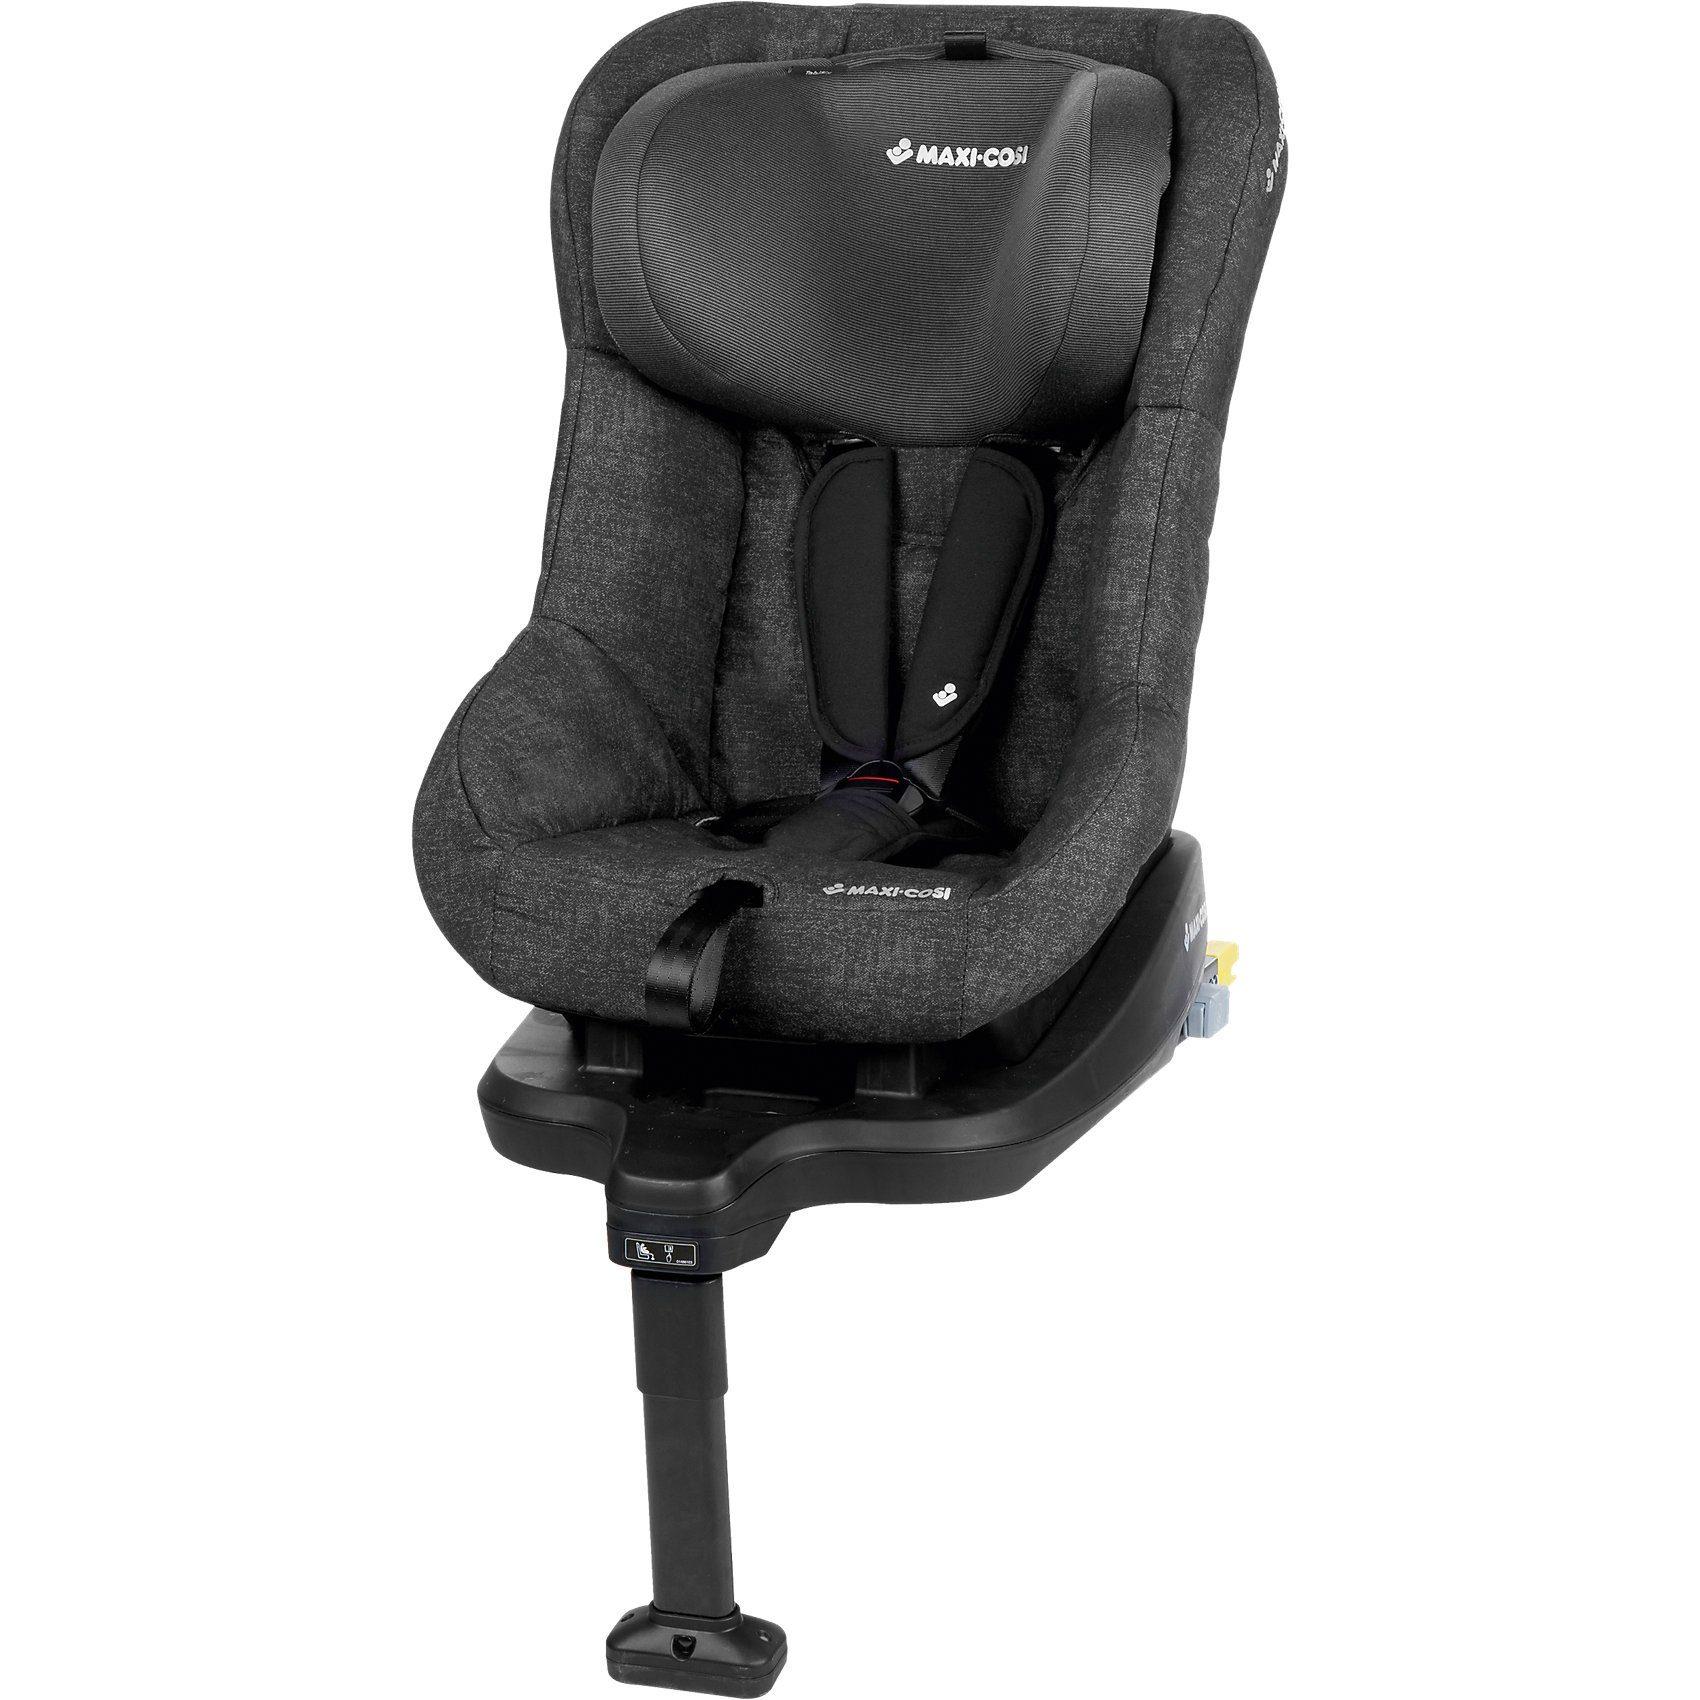 Maxi-Cosi Auto-Kindersitz TobiFix, Nomad Black, 2018